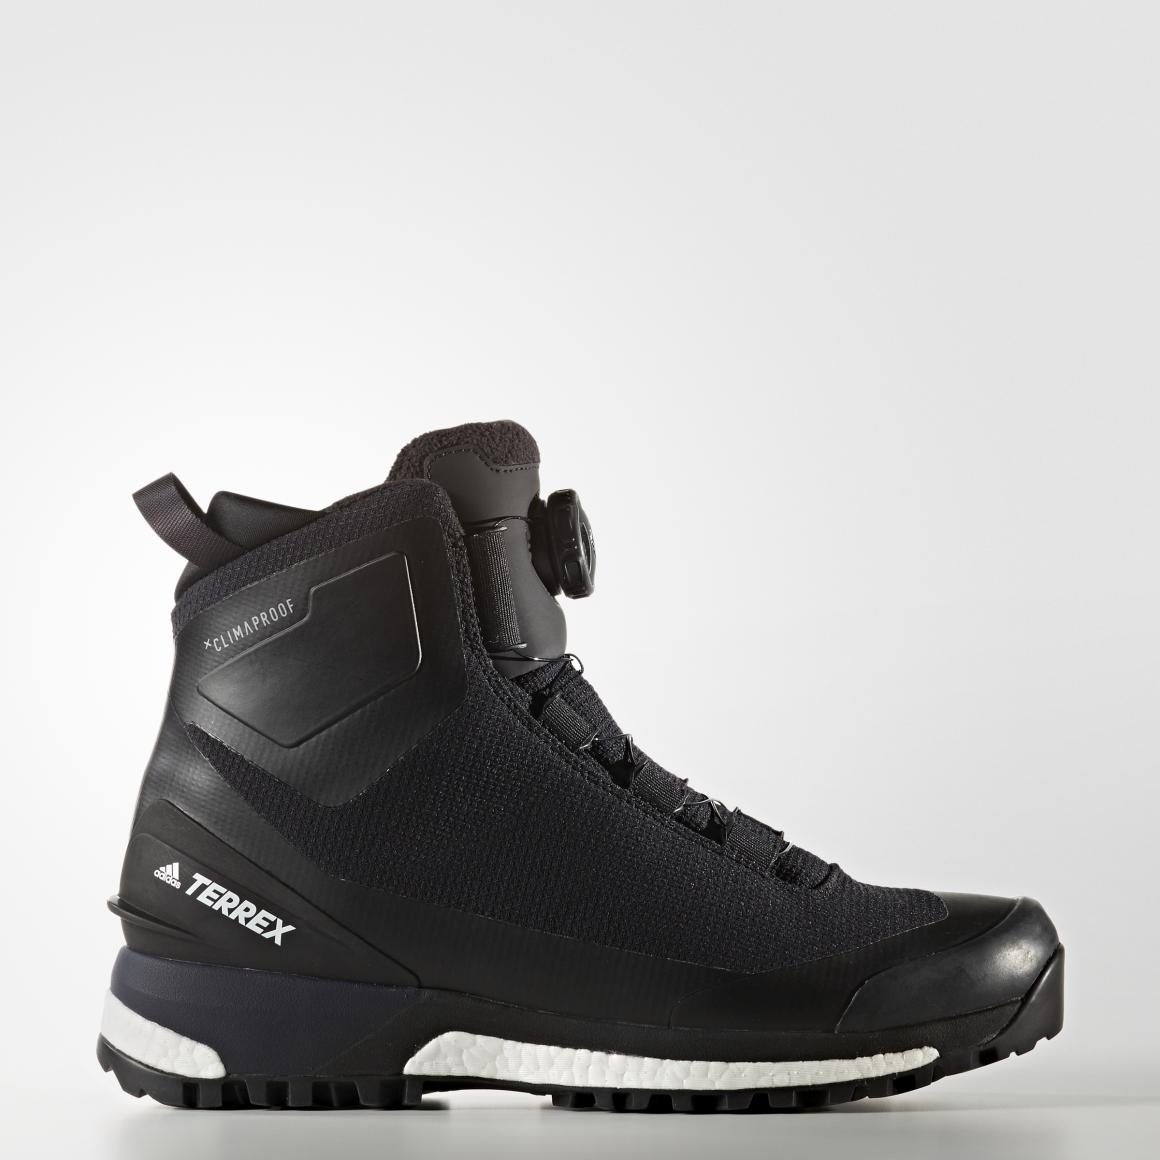 Adidas TERREX CONRAX BOA C CBLACK/FTWWHT/ENERGY, pohodni čevlji, črna